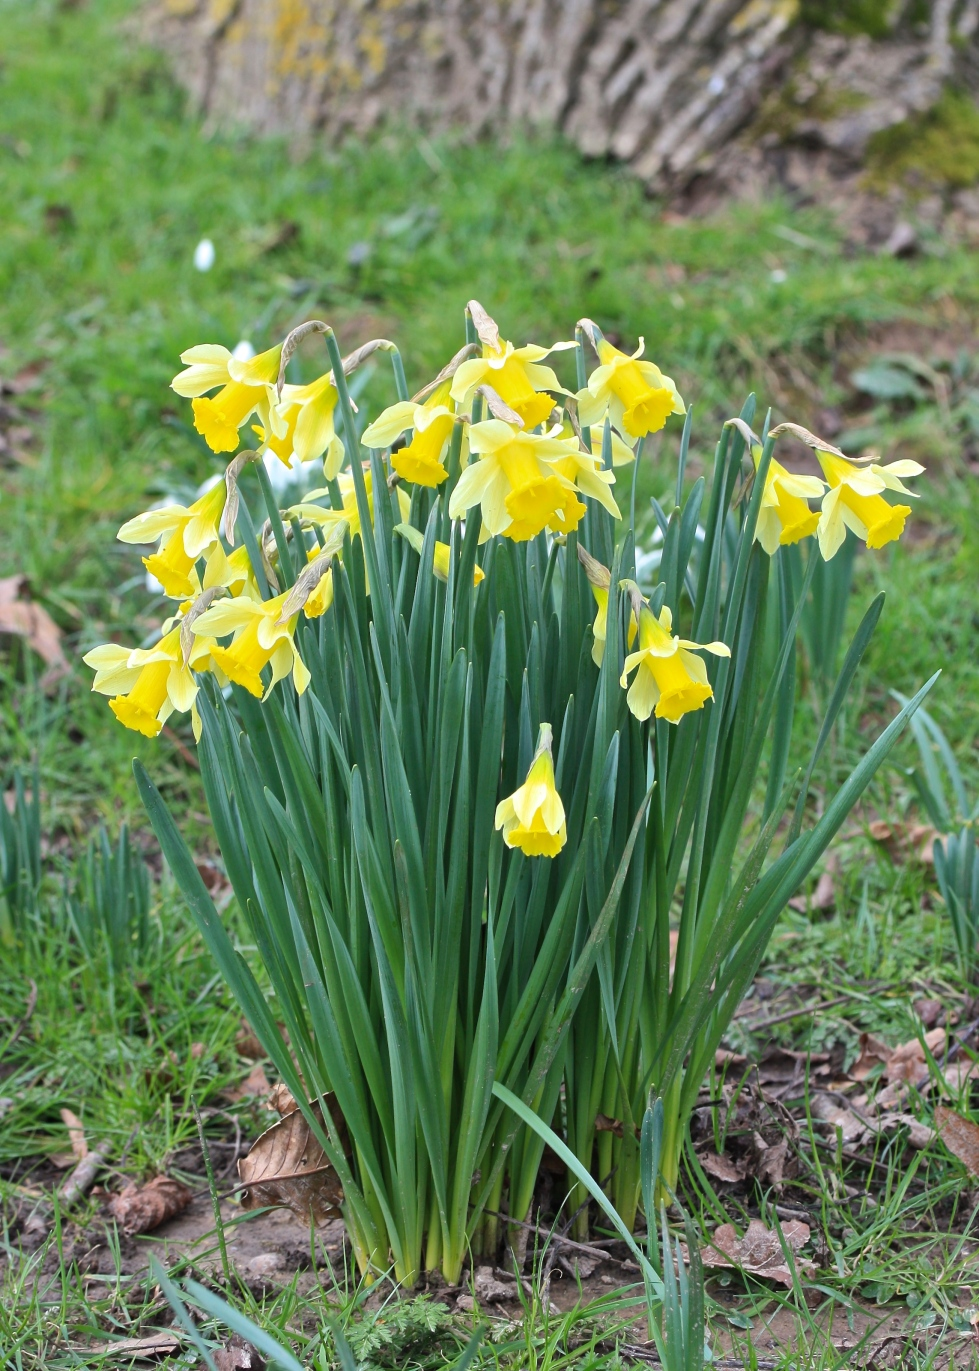 NarcNarcissi, Goodnestone Park, Kent, February 2016